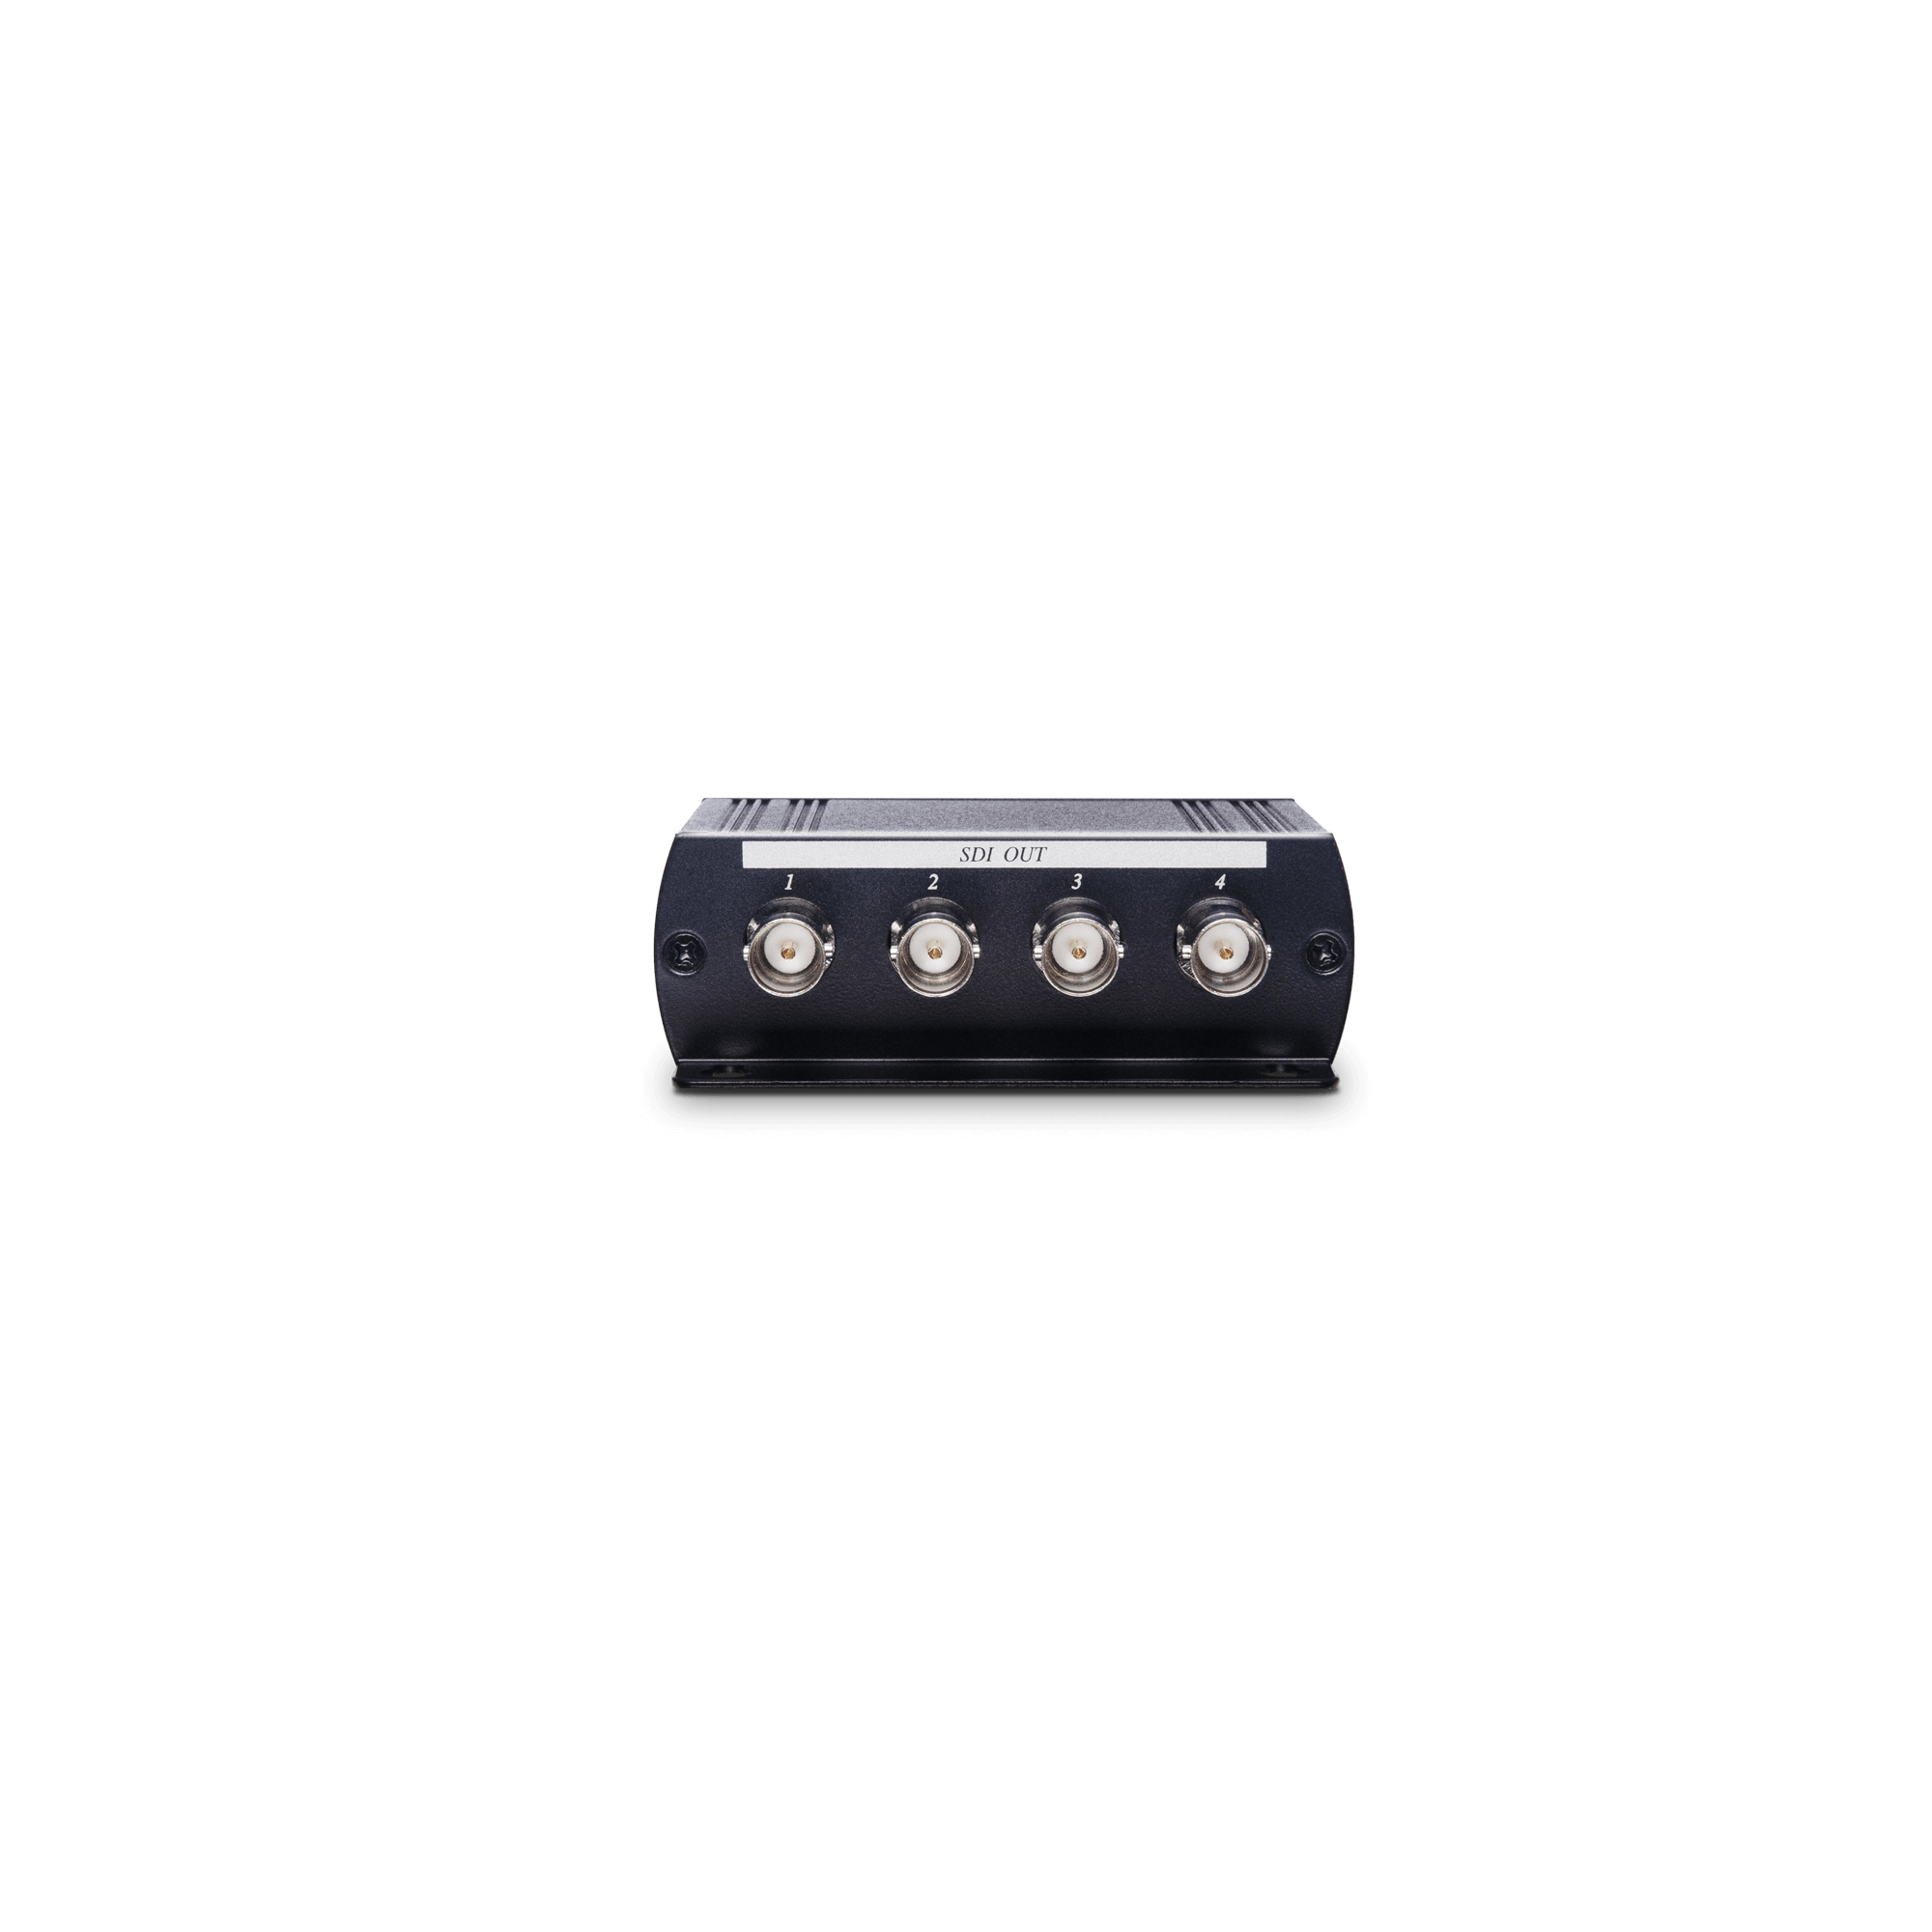 1 x 4 Output 3G-SDI Distribution Amplifier